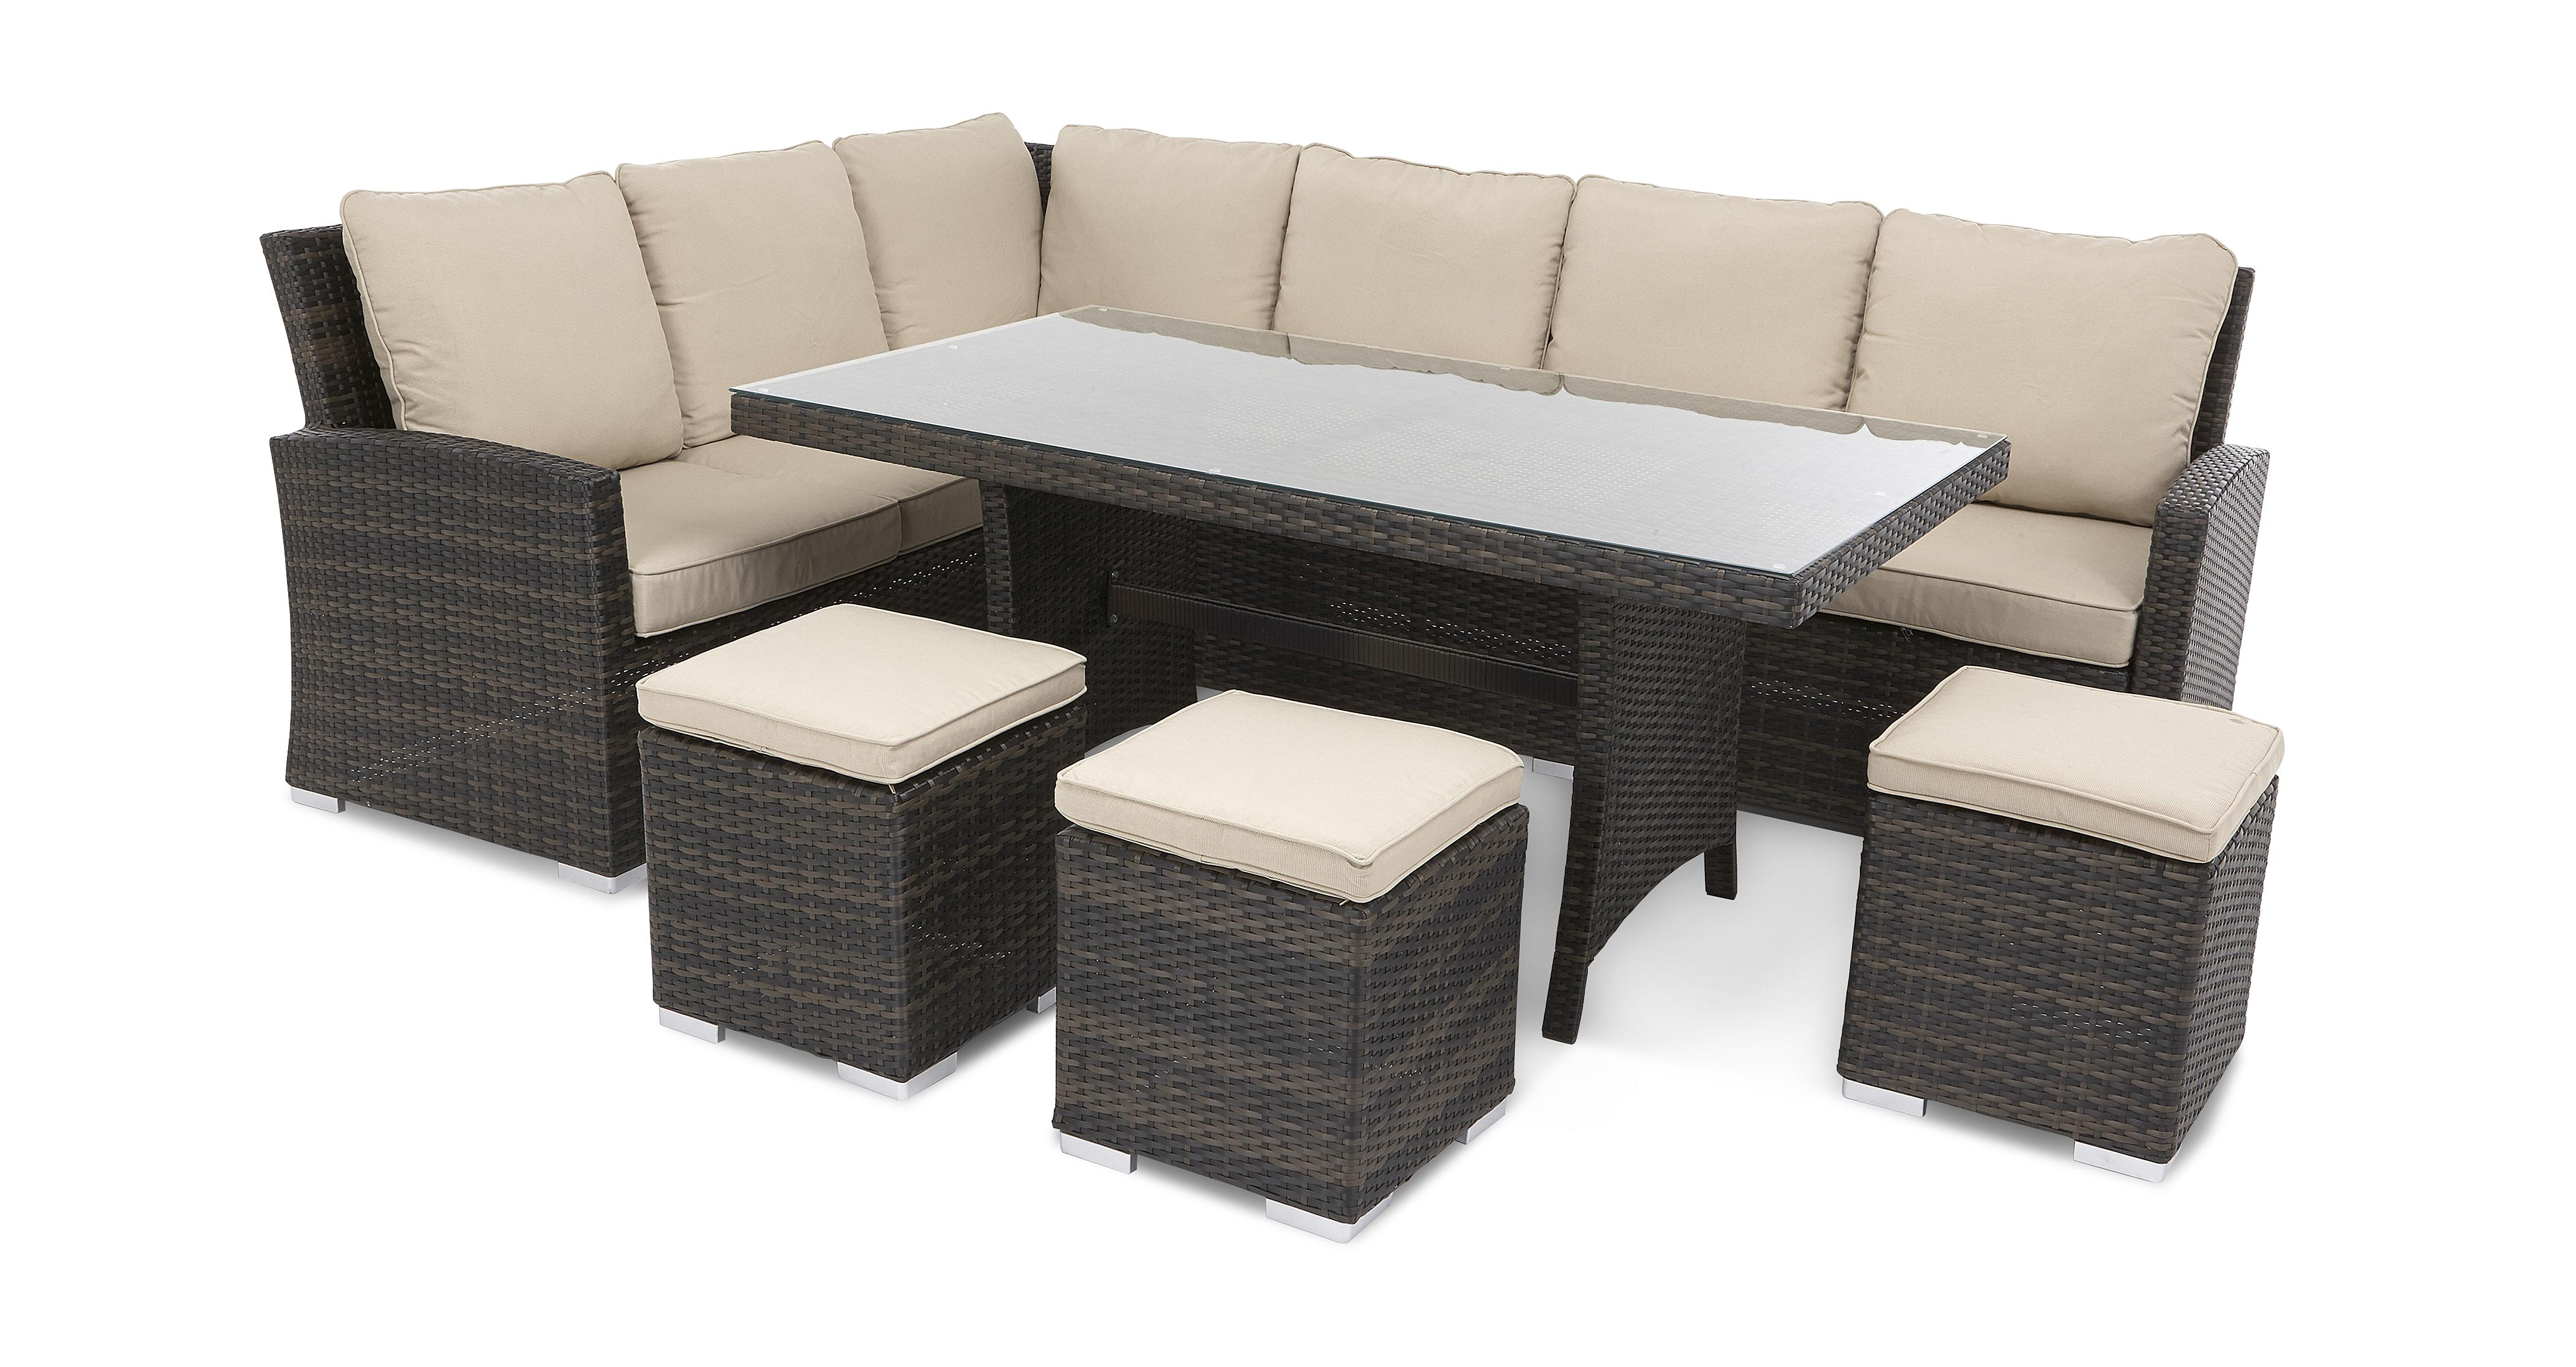 Tremendous Provence Sofa Set Ibusinesslaw Wood Chair Design Ideas Ibusinesslaworg